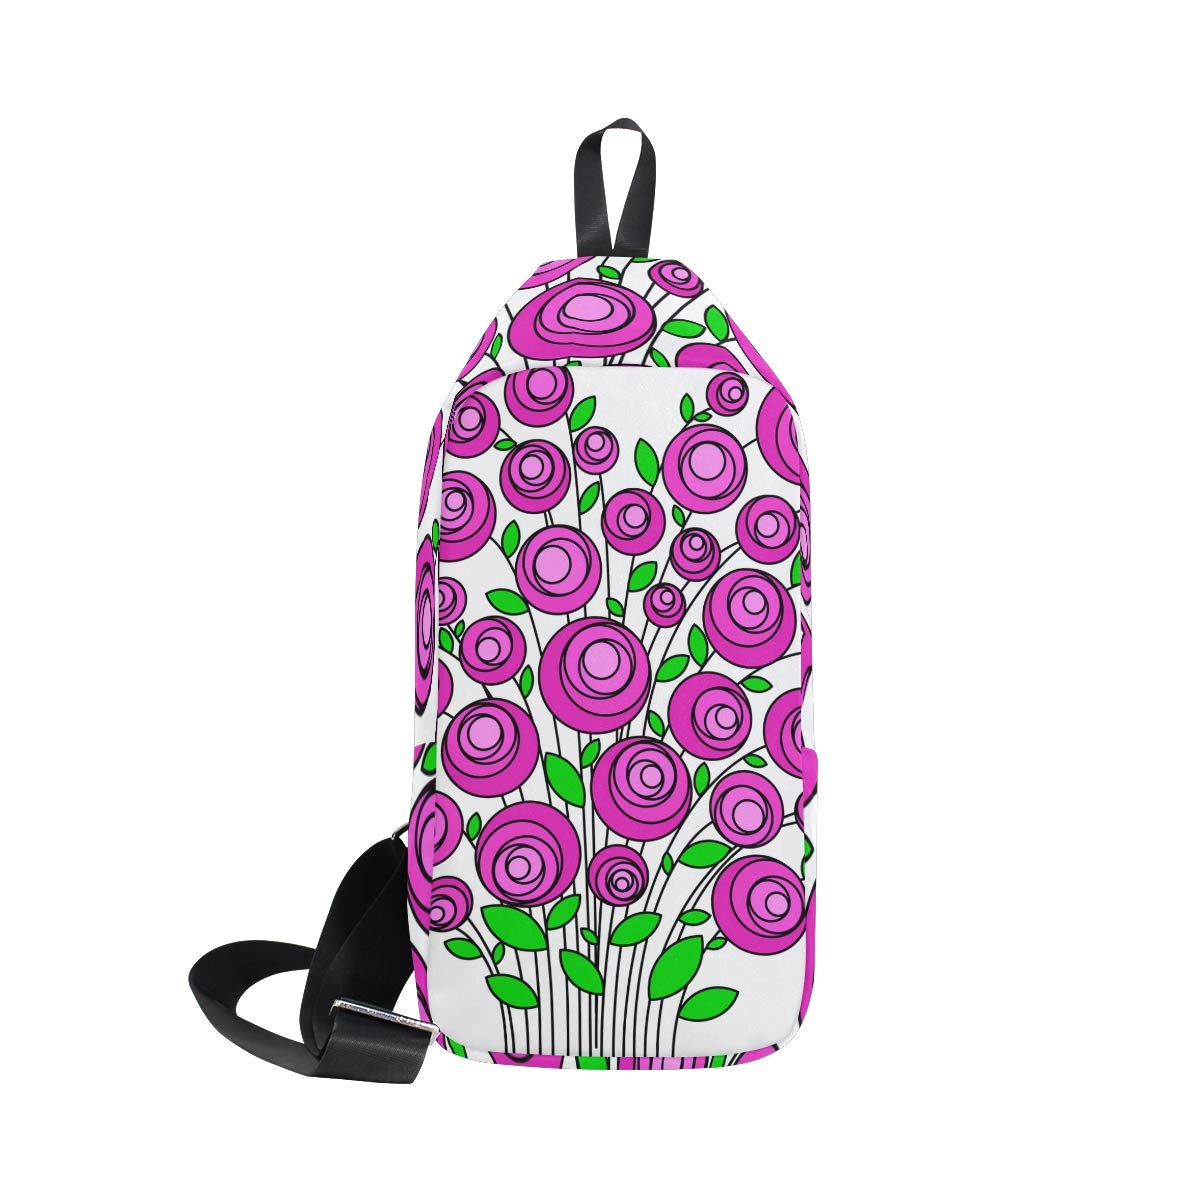 Unisex Messenger Bag Bouquet Of Flowers Shoulder Chest Cross Body Backpack Bag